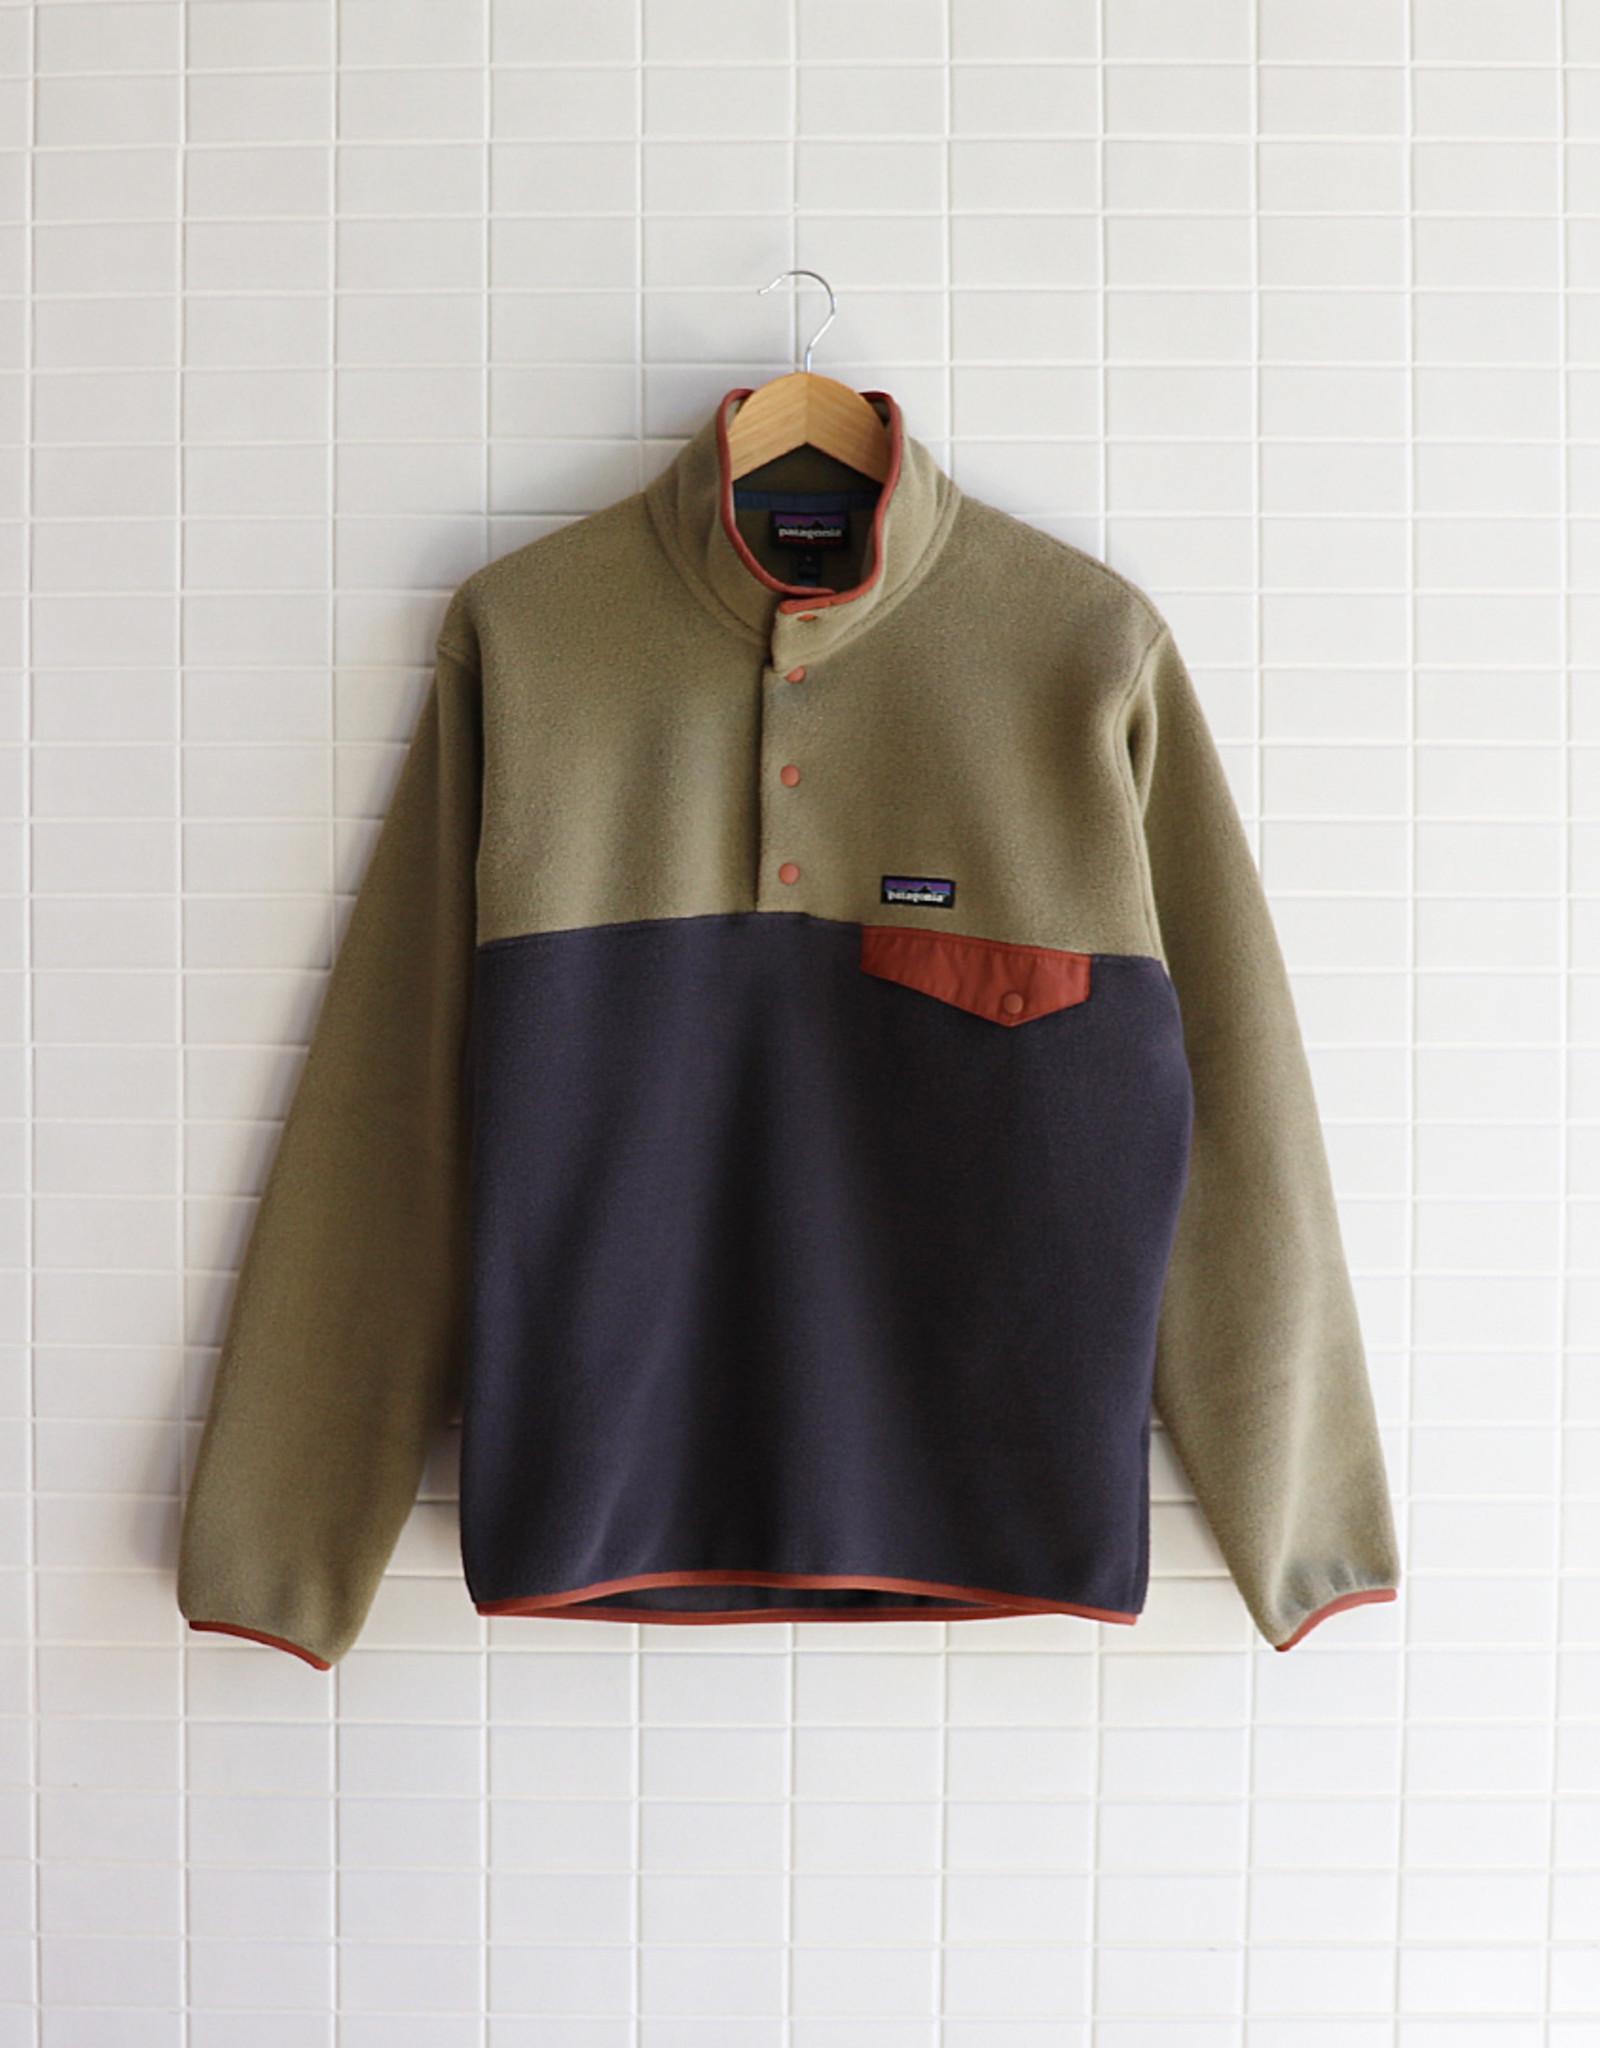 Patagonia - Men's Lightweight Synchilla Snap-T Fleece Pullover - Sage Khaki